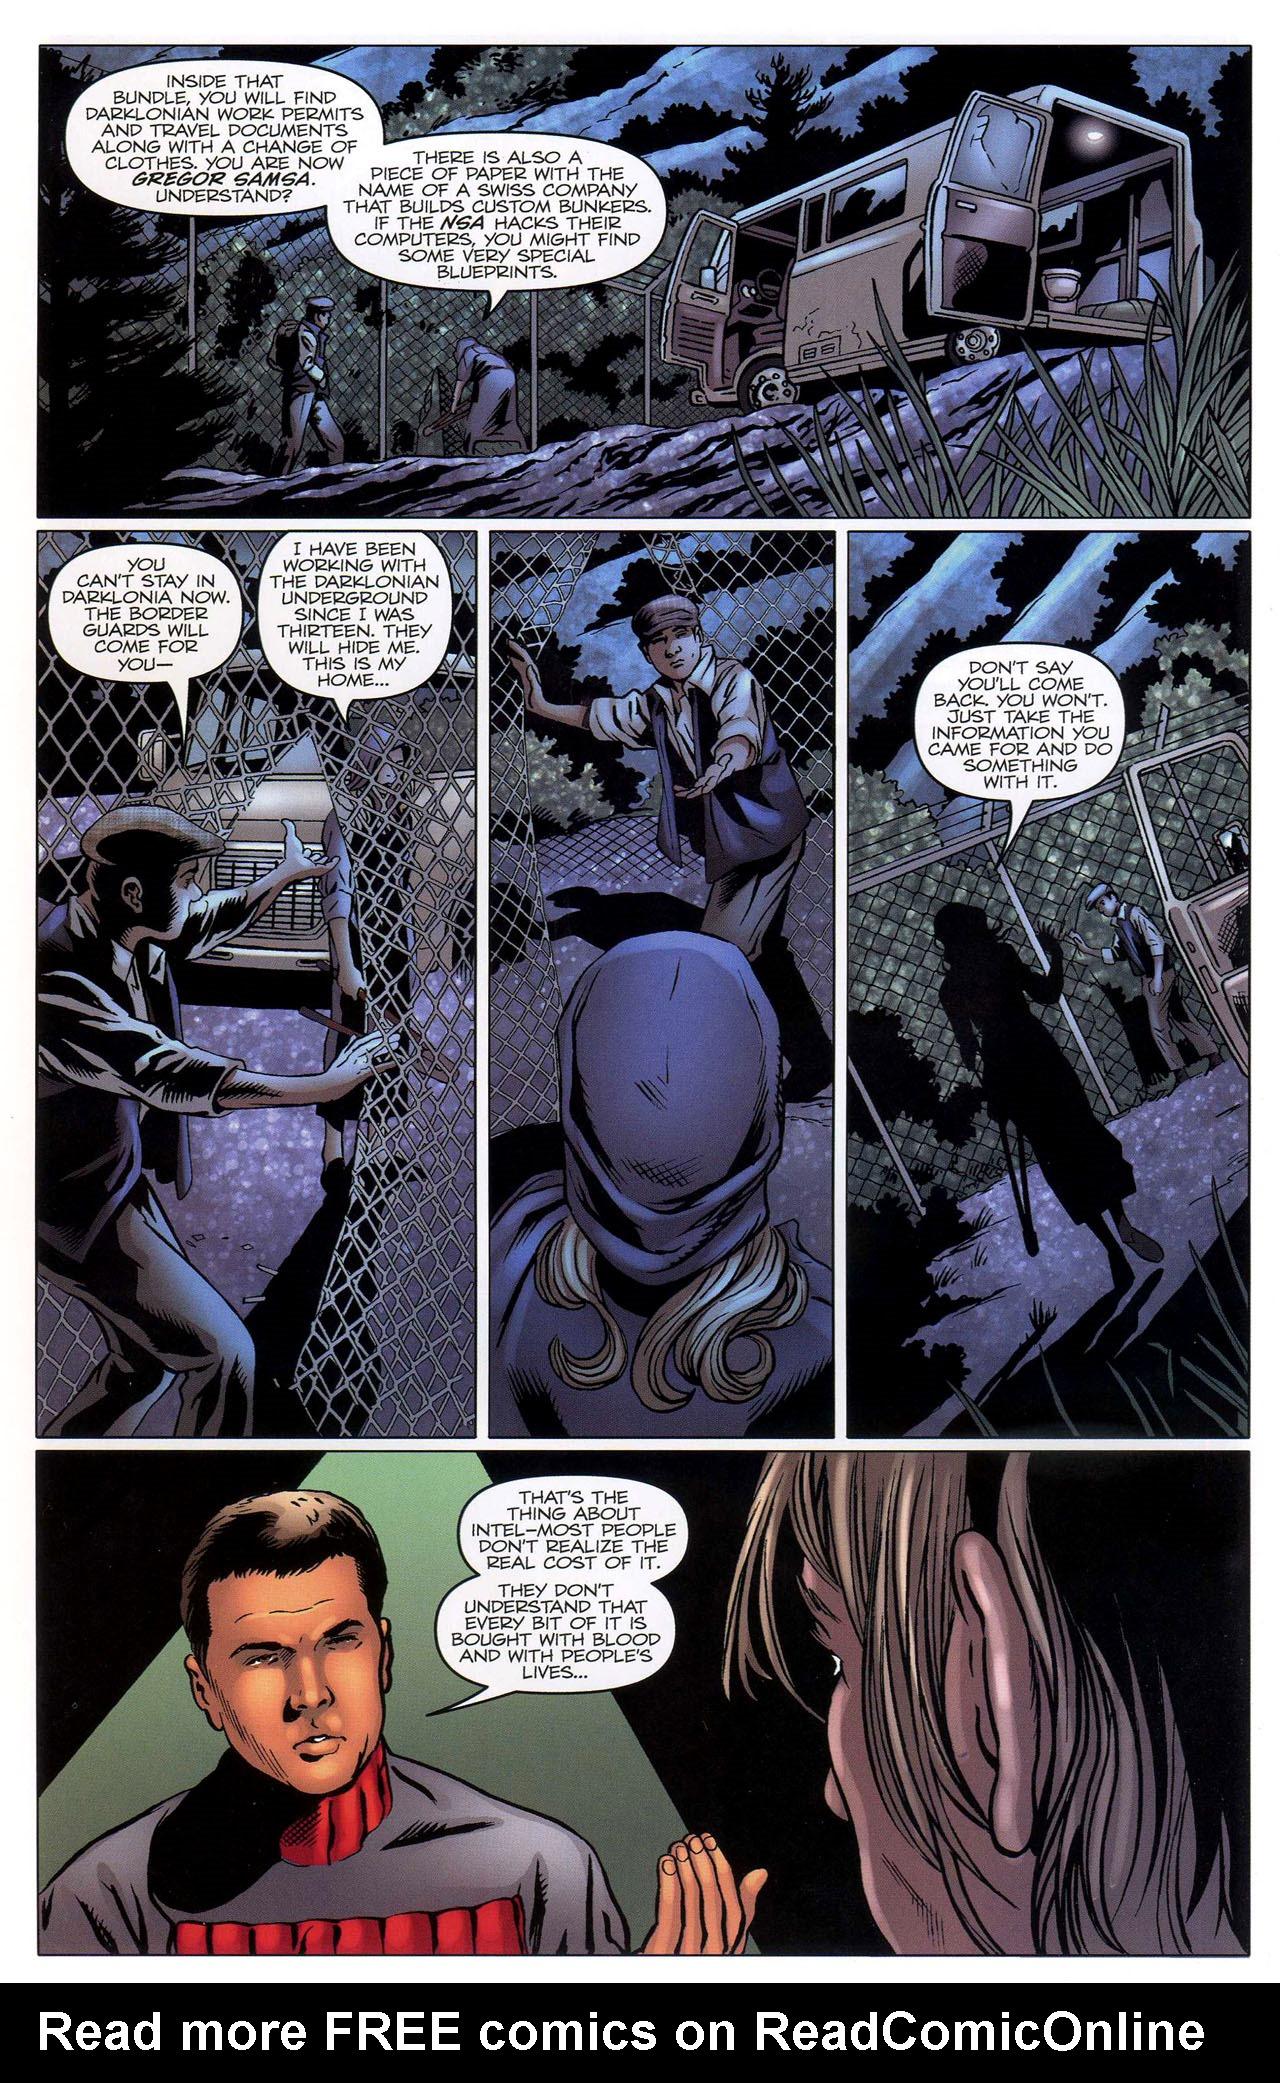 G.I. Joe: A Real American Hero 171 Page 20